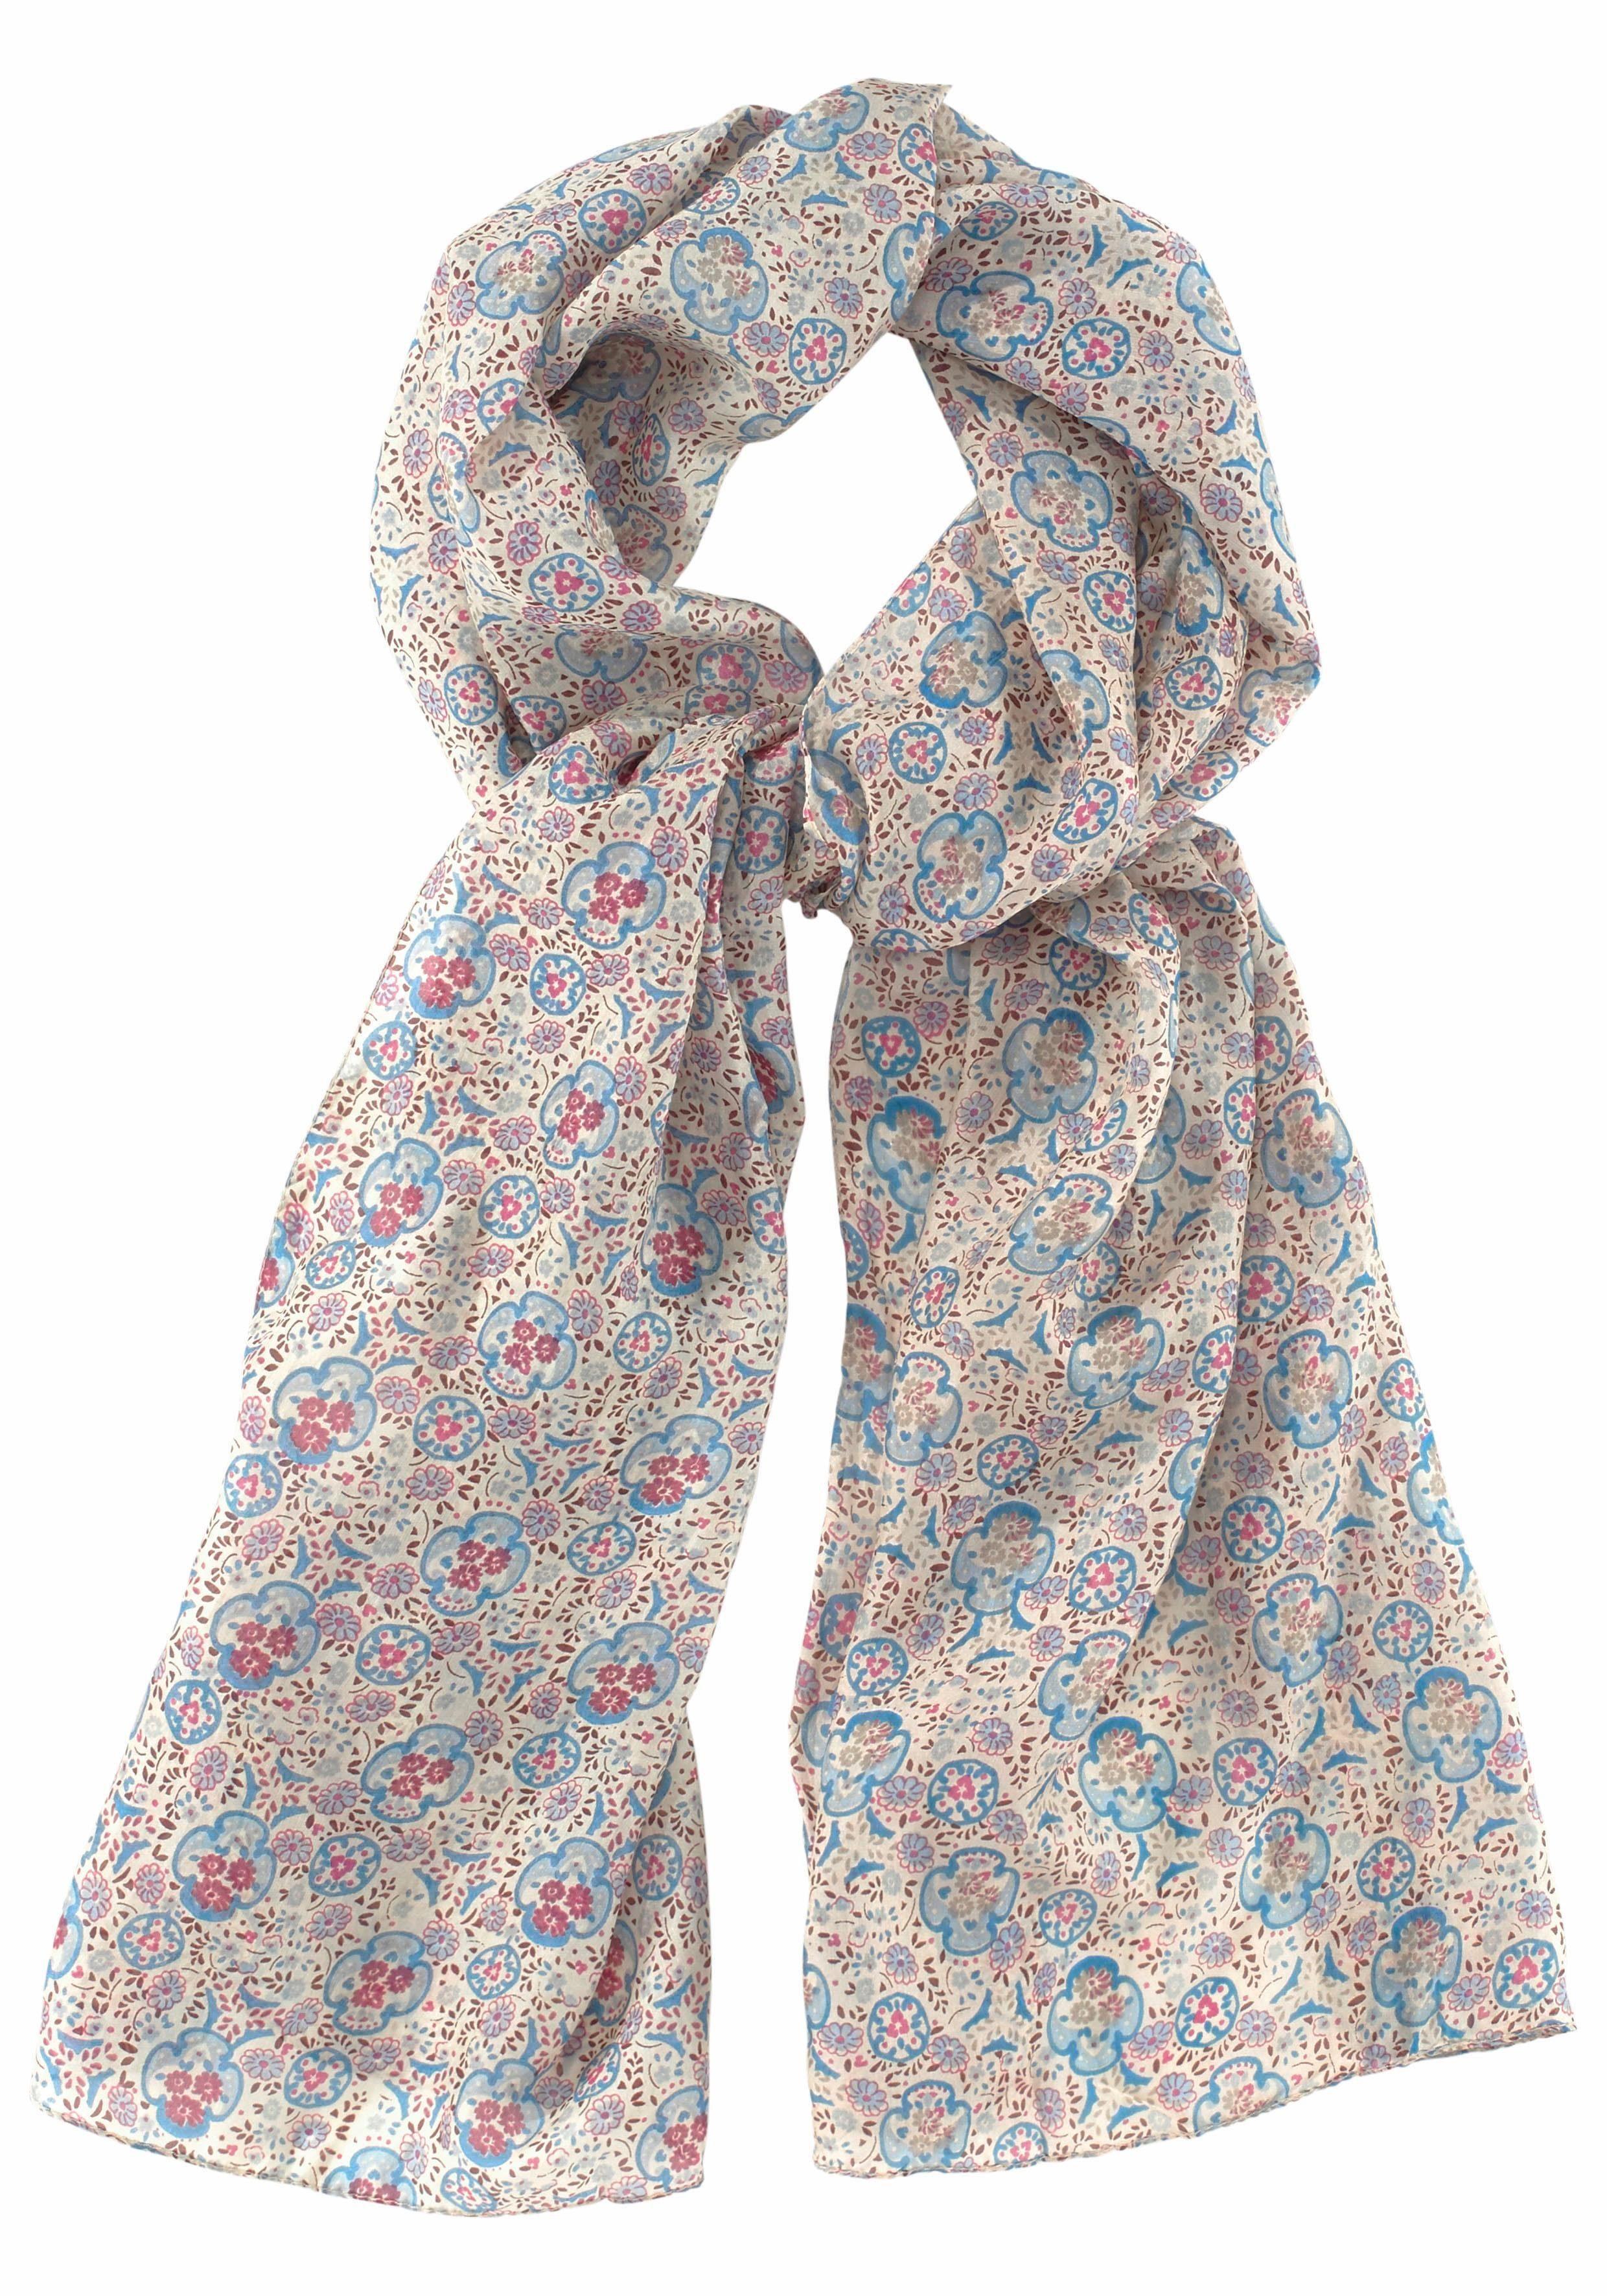 J. Jayz Seidenschal mit floralem Muster